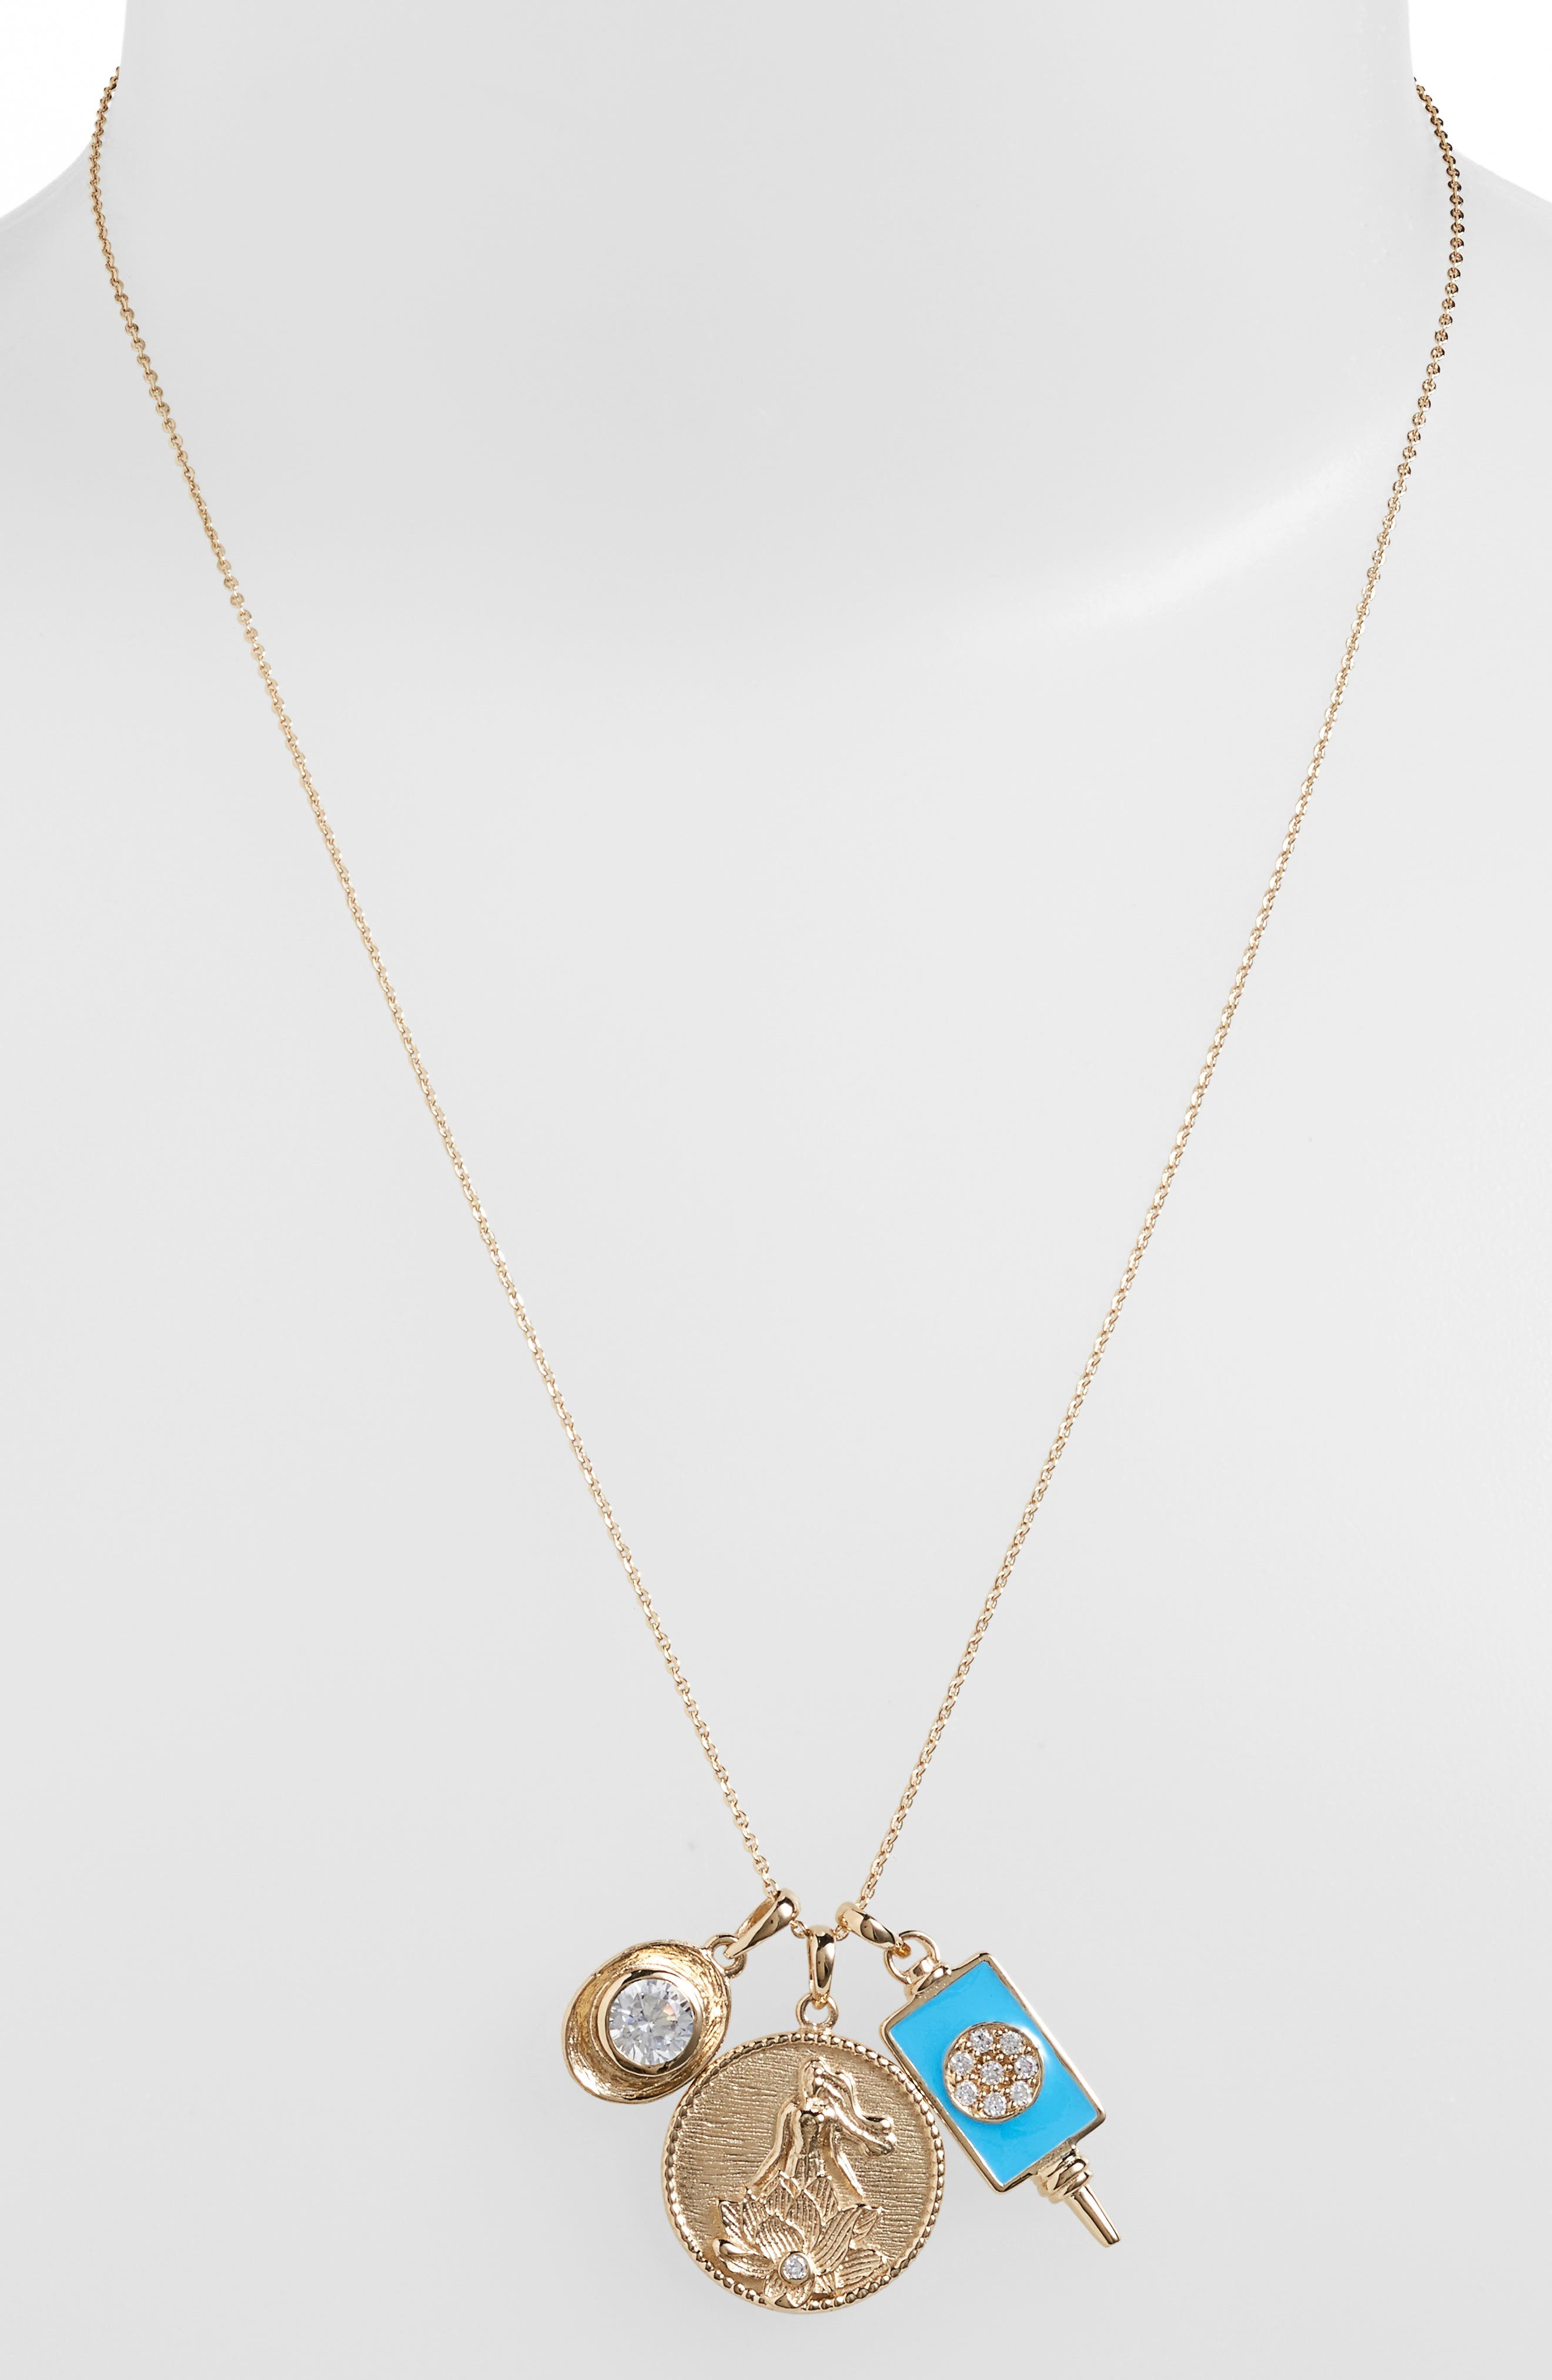 Main Image - Melinda Maria Goddess of Good Fortune Cluster Pendant Necklace